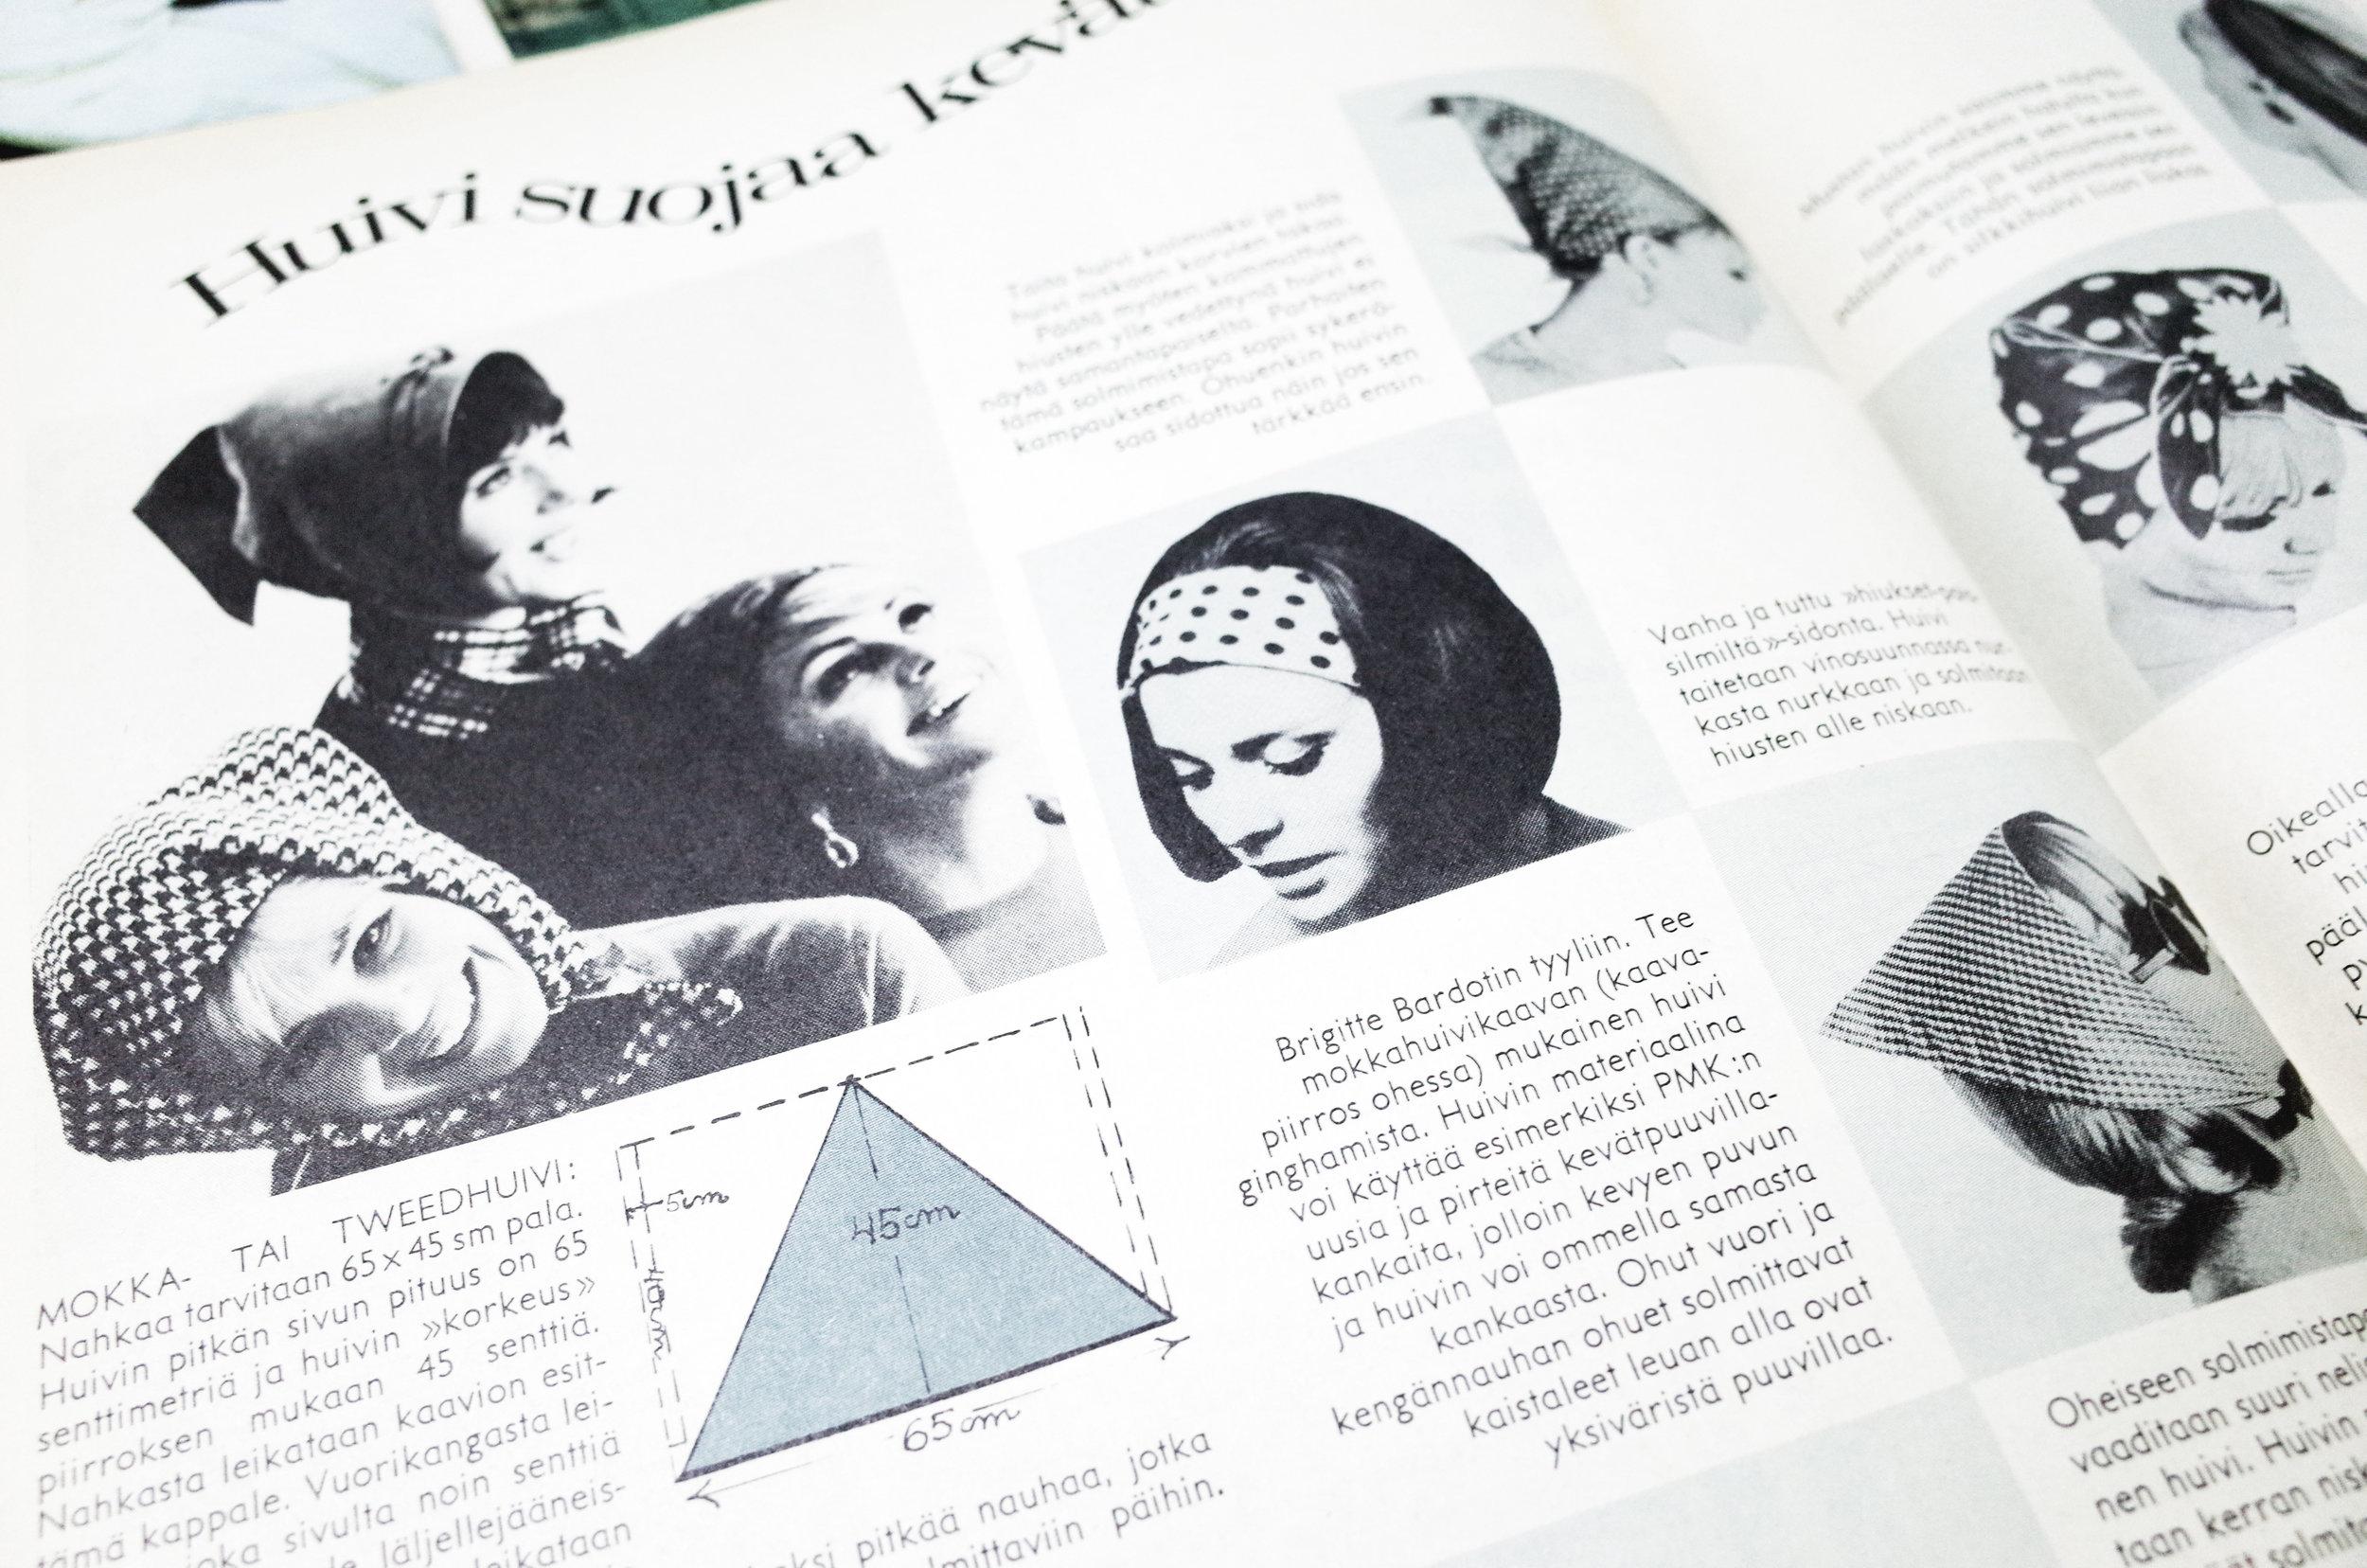 3 ME NAISET (1964) - 這本是60 年代出版的生活時尚雜誌。觀察以前的女性穿衣風格和廣告設計,我們可以了解到當時北歐人們的生活方式和進程。古書店的店主把它保存得原好,我特別佩服北歐VINTAGE 店的專門和講究,有些店甚至將衣服的年期分類,對我來說簡直是天堂。